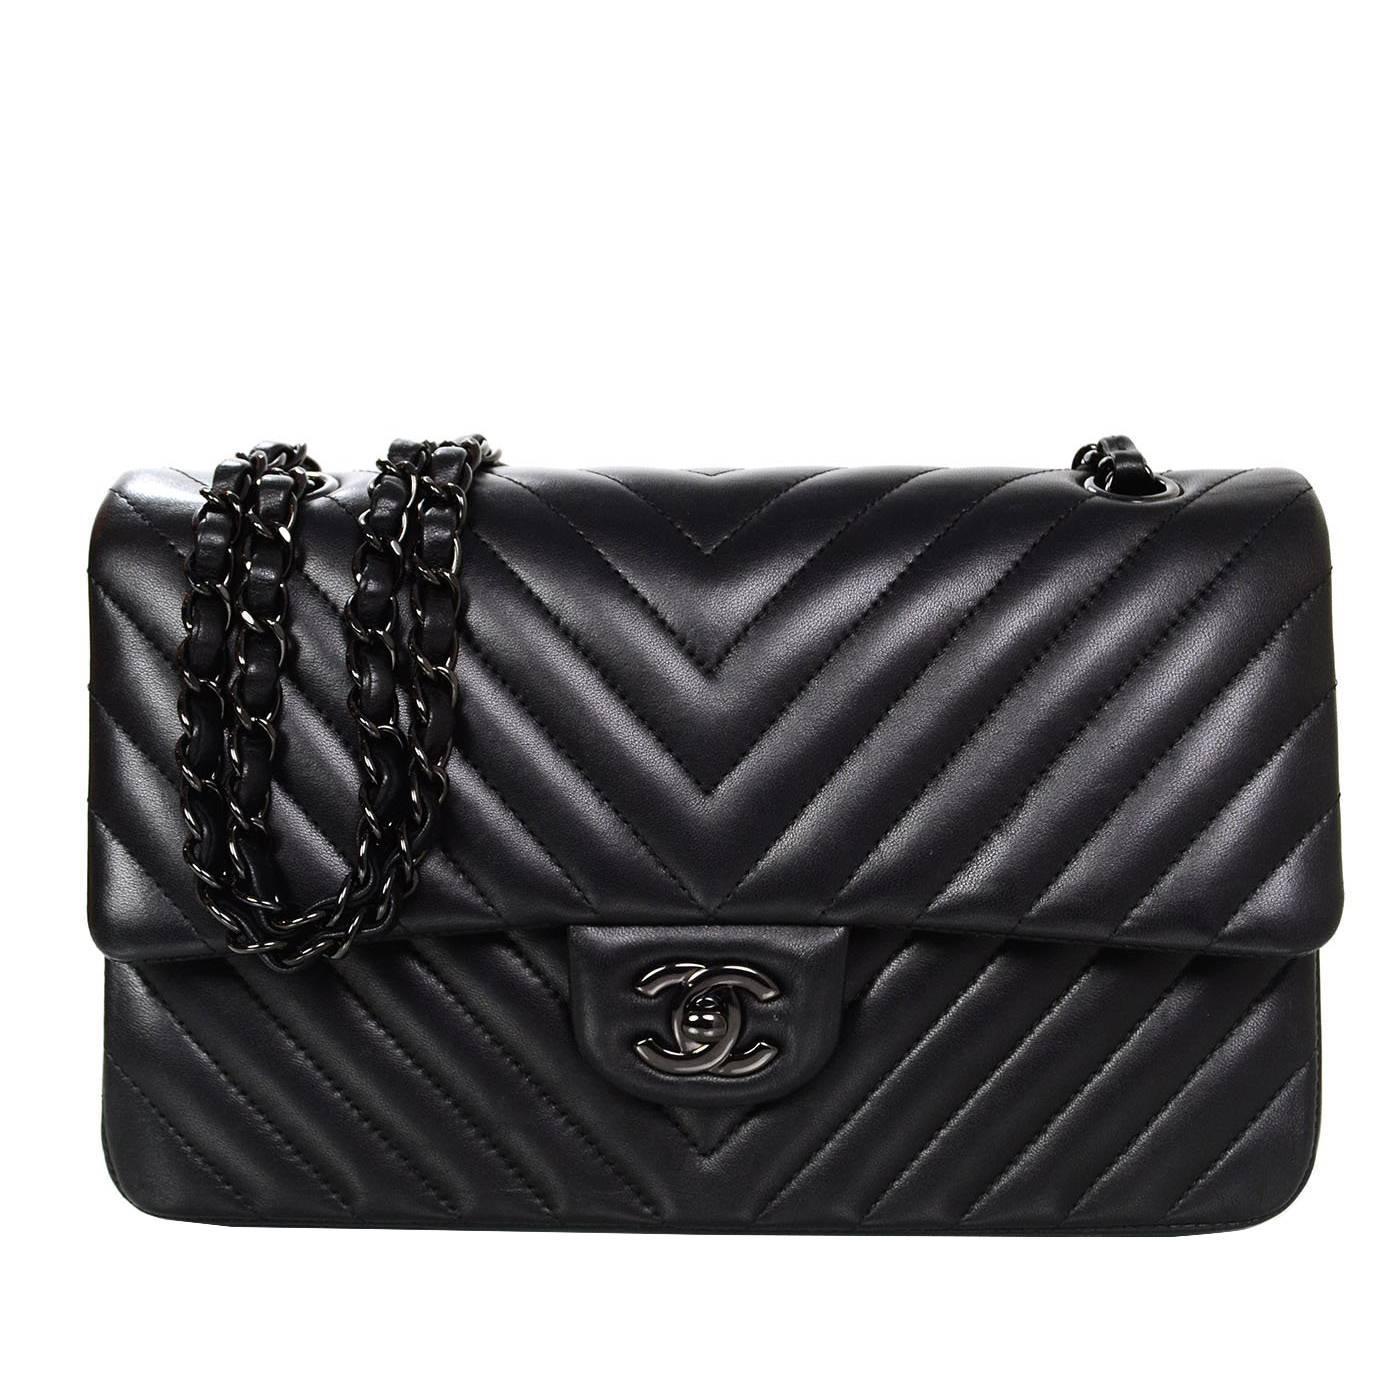 4195d2f7d5 Chanel Rare Chevron So Black 10 Double Flap Classic Bag At 1stdibs